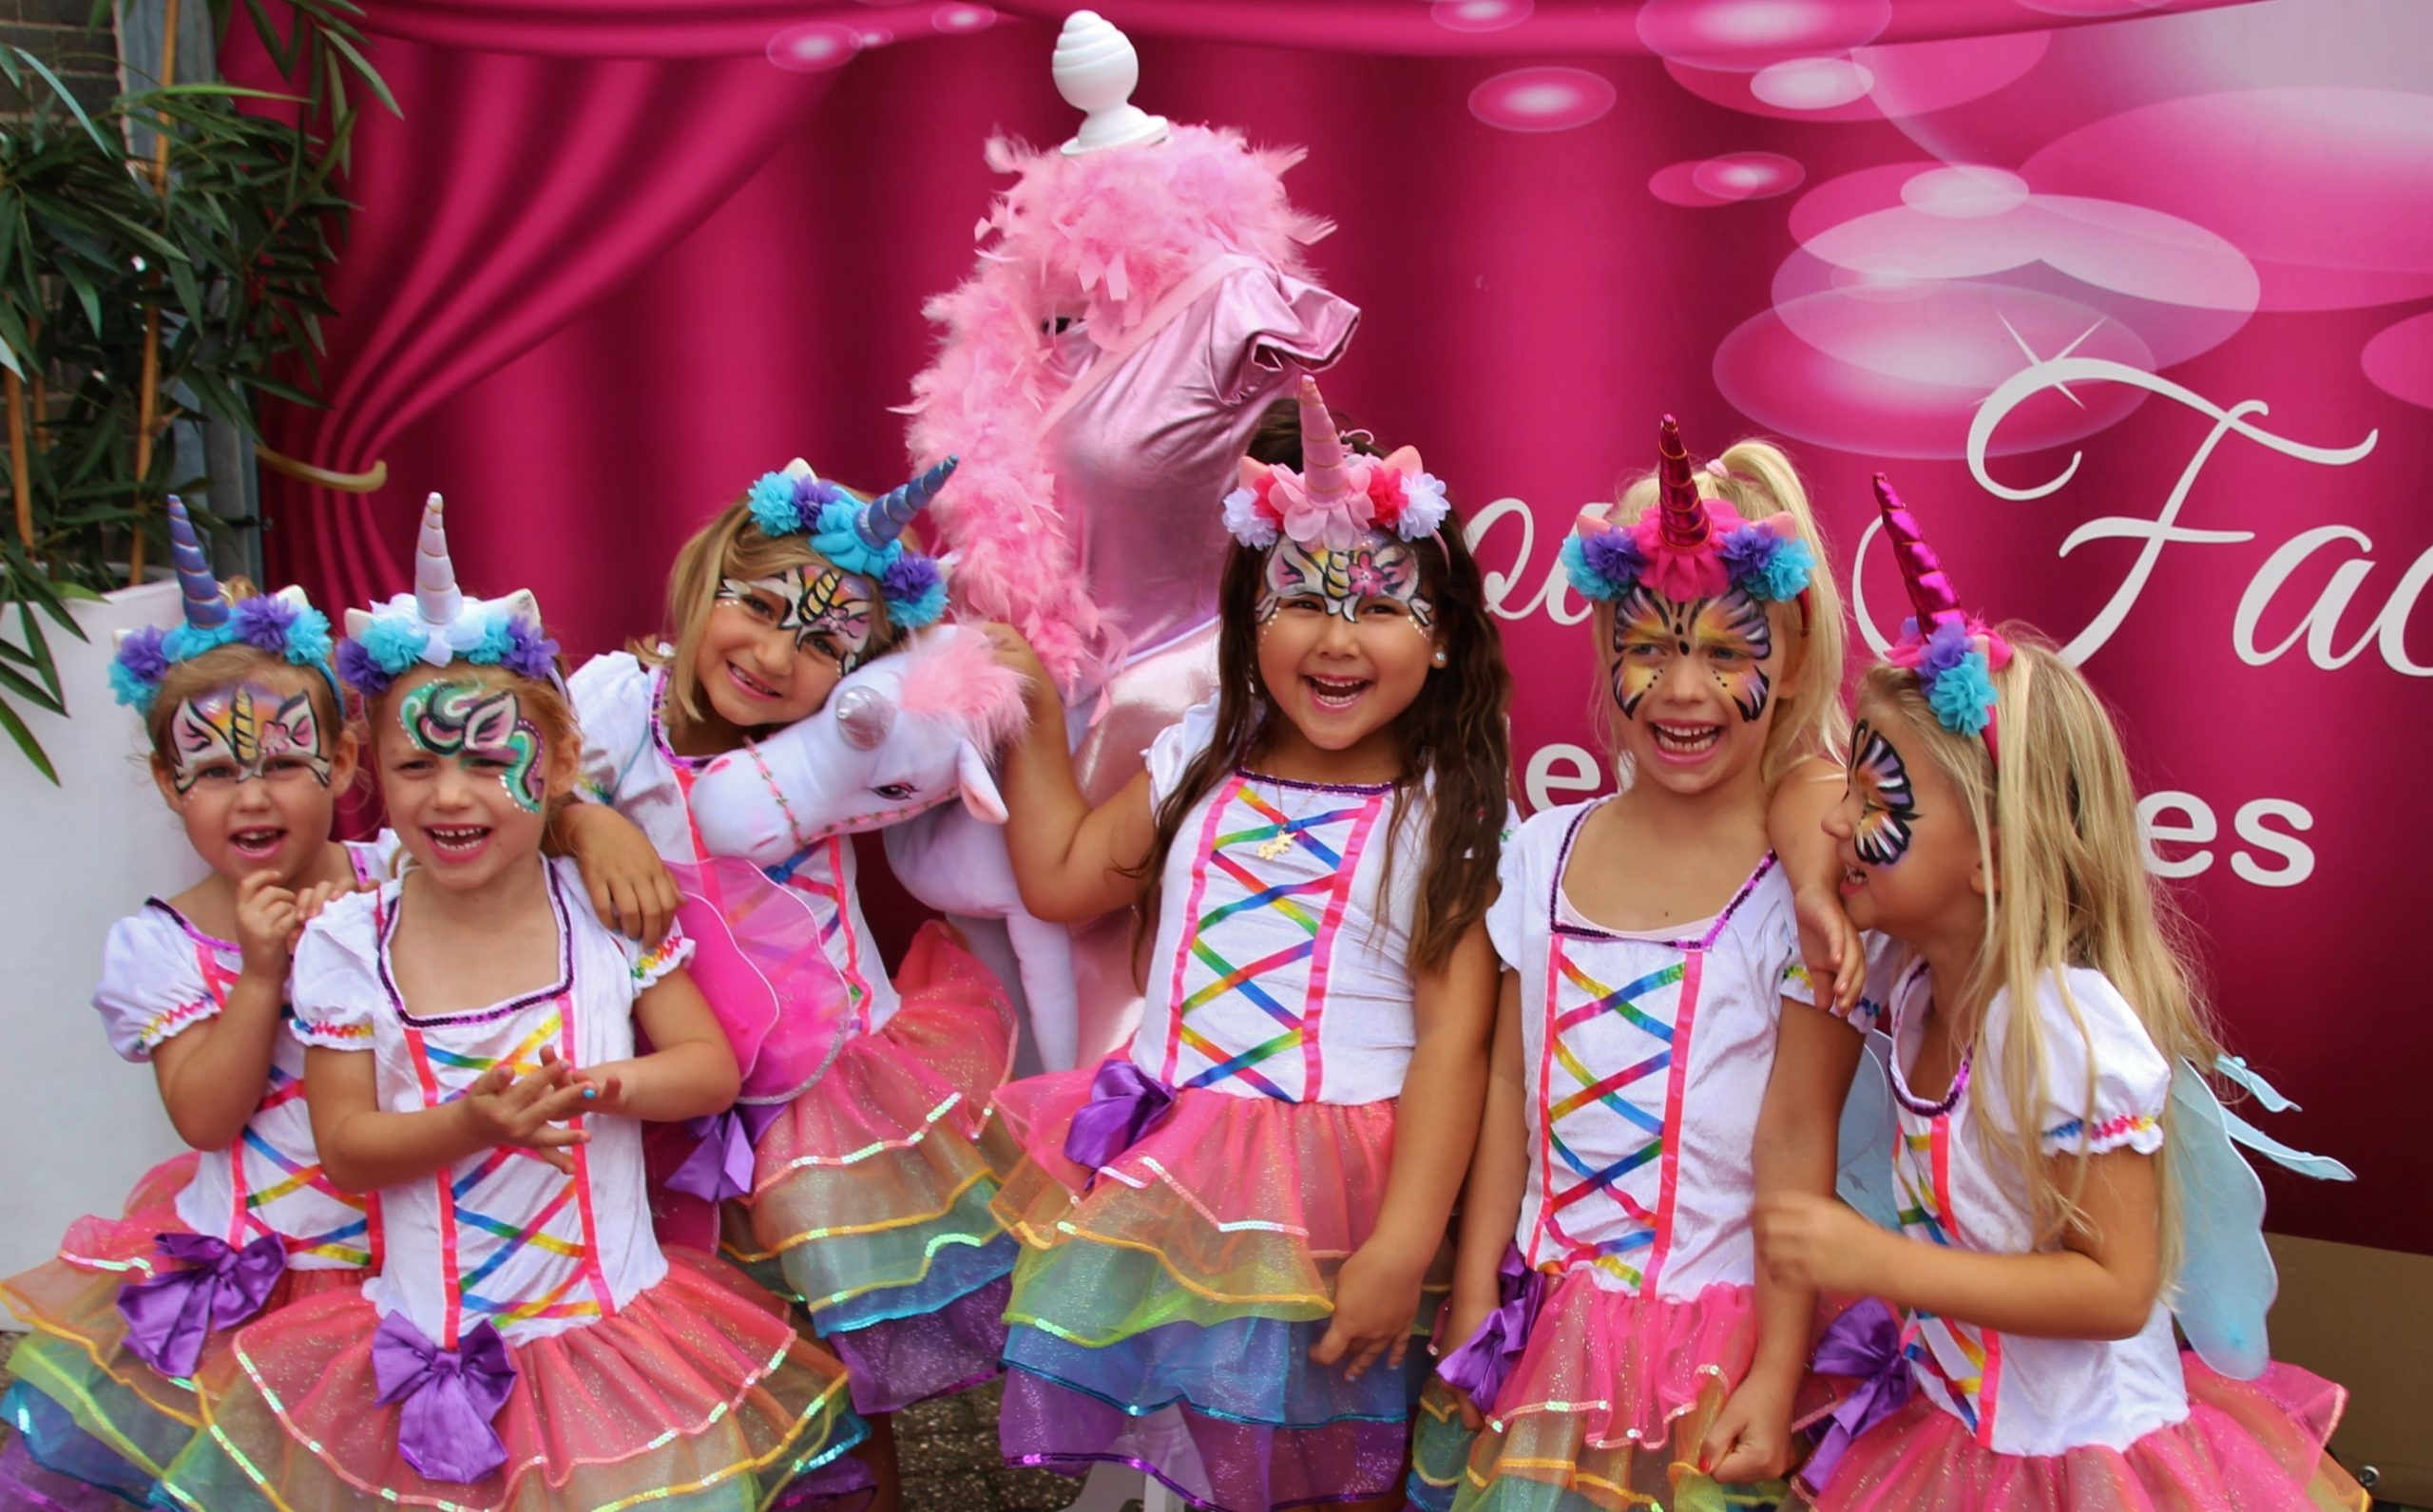 Halloween Feest Almere.Schmink Glamour Kinderfeestjes In Almere Glamour Faces